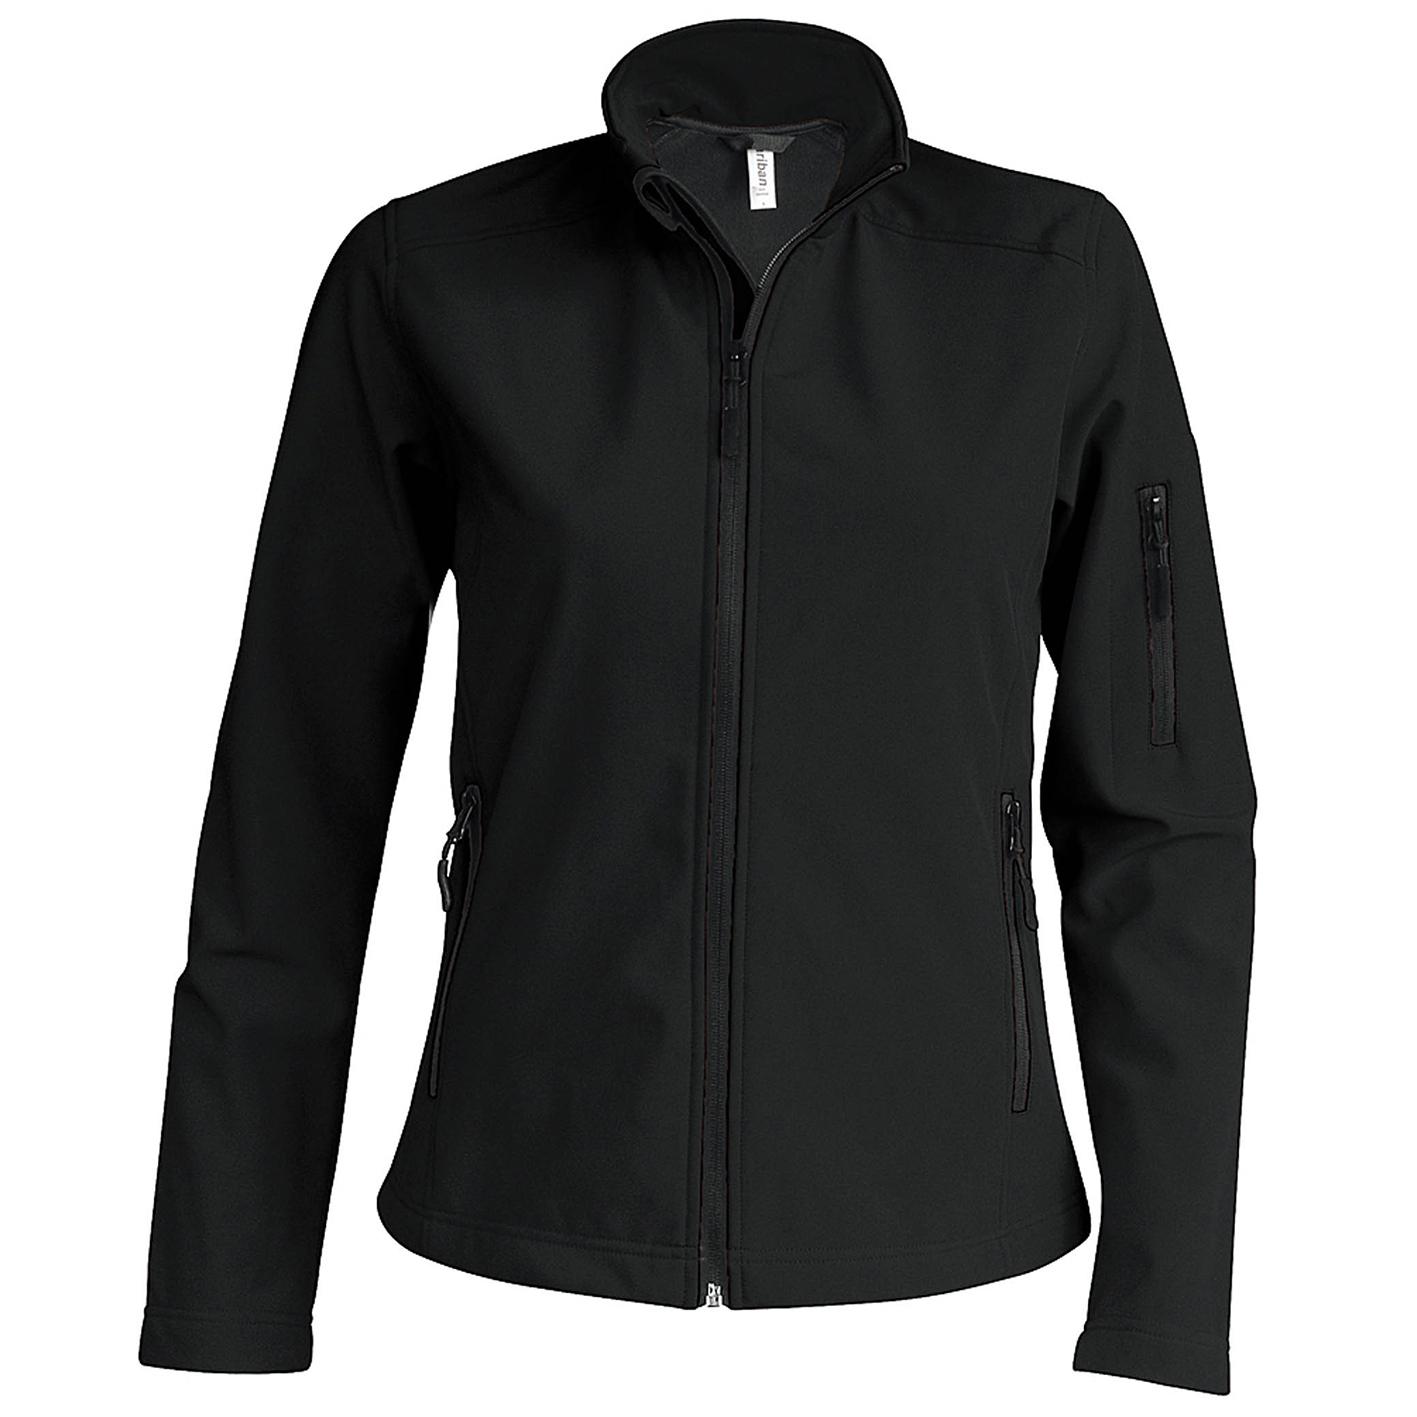 Kariban Womens/Ladies Contemporary Softshell 3 Layer Performance Jacket (M) (Black)